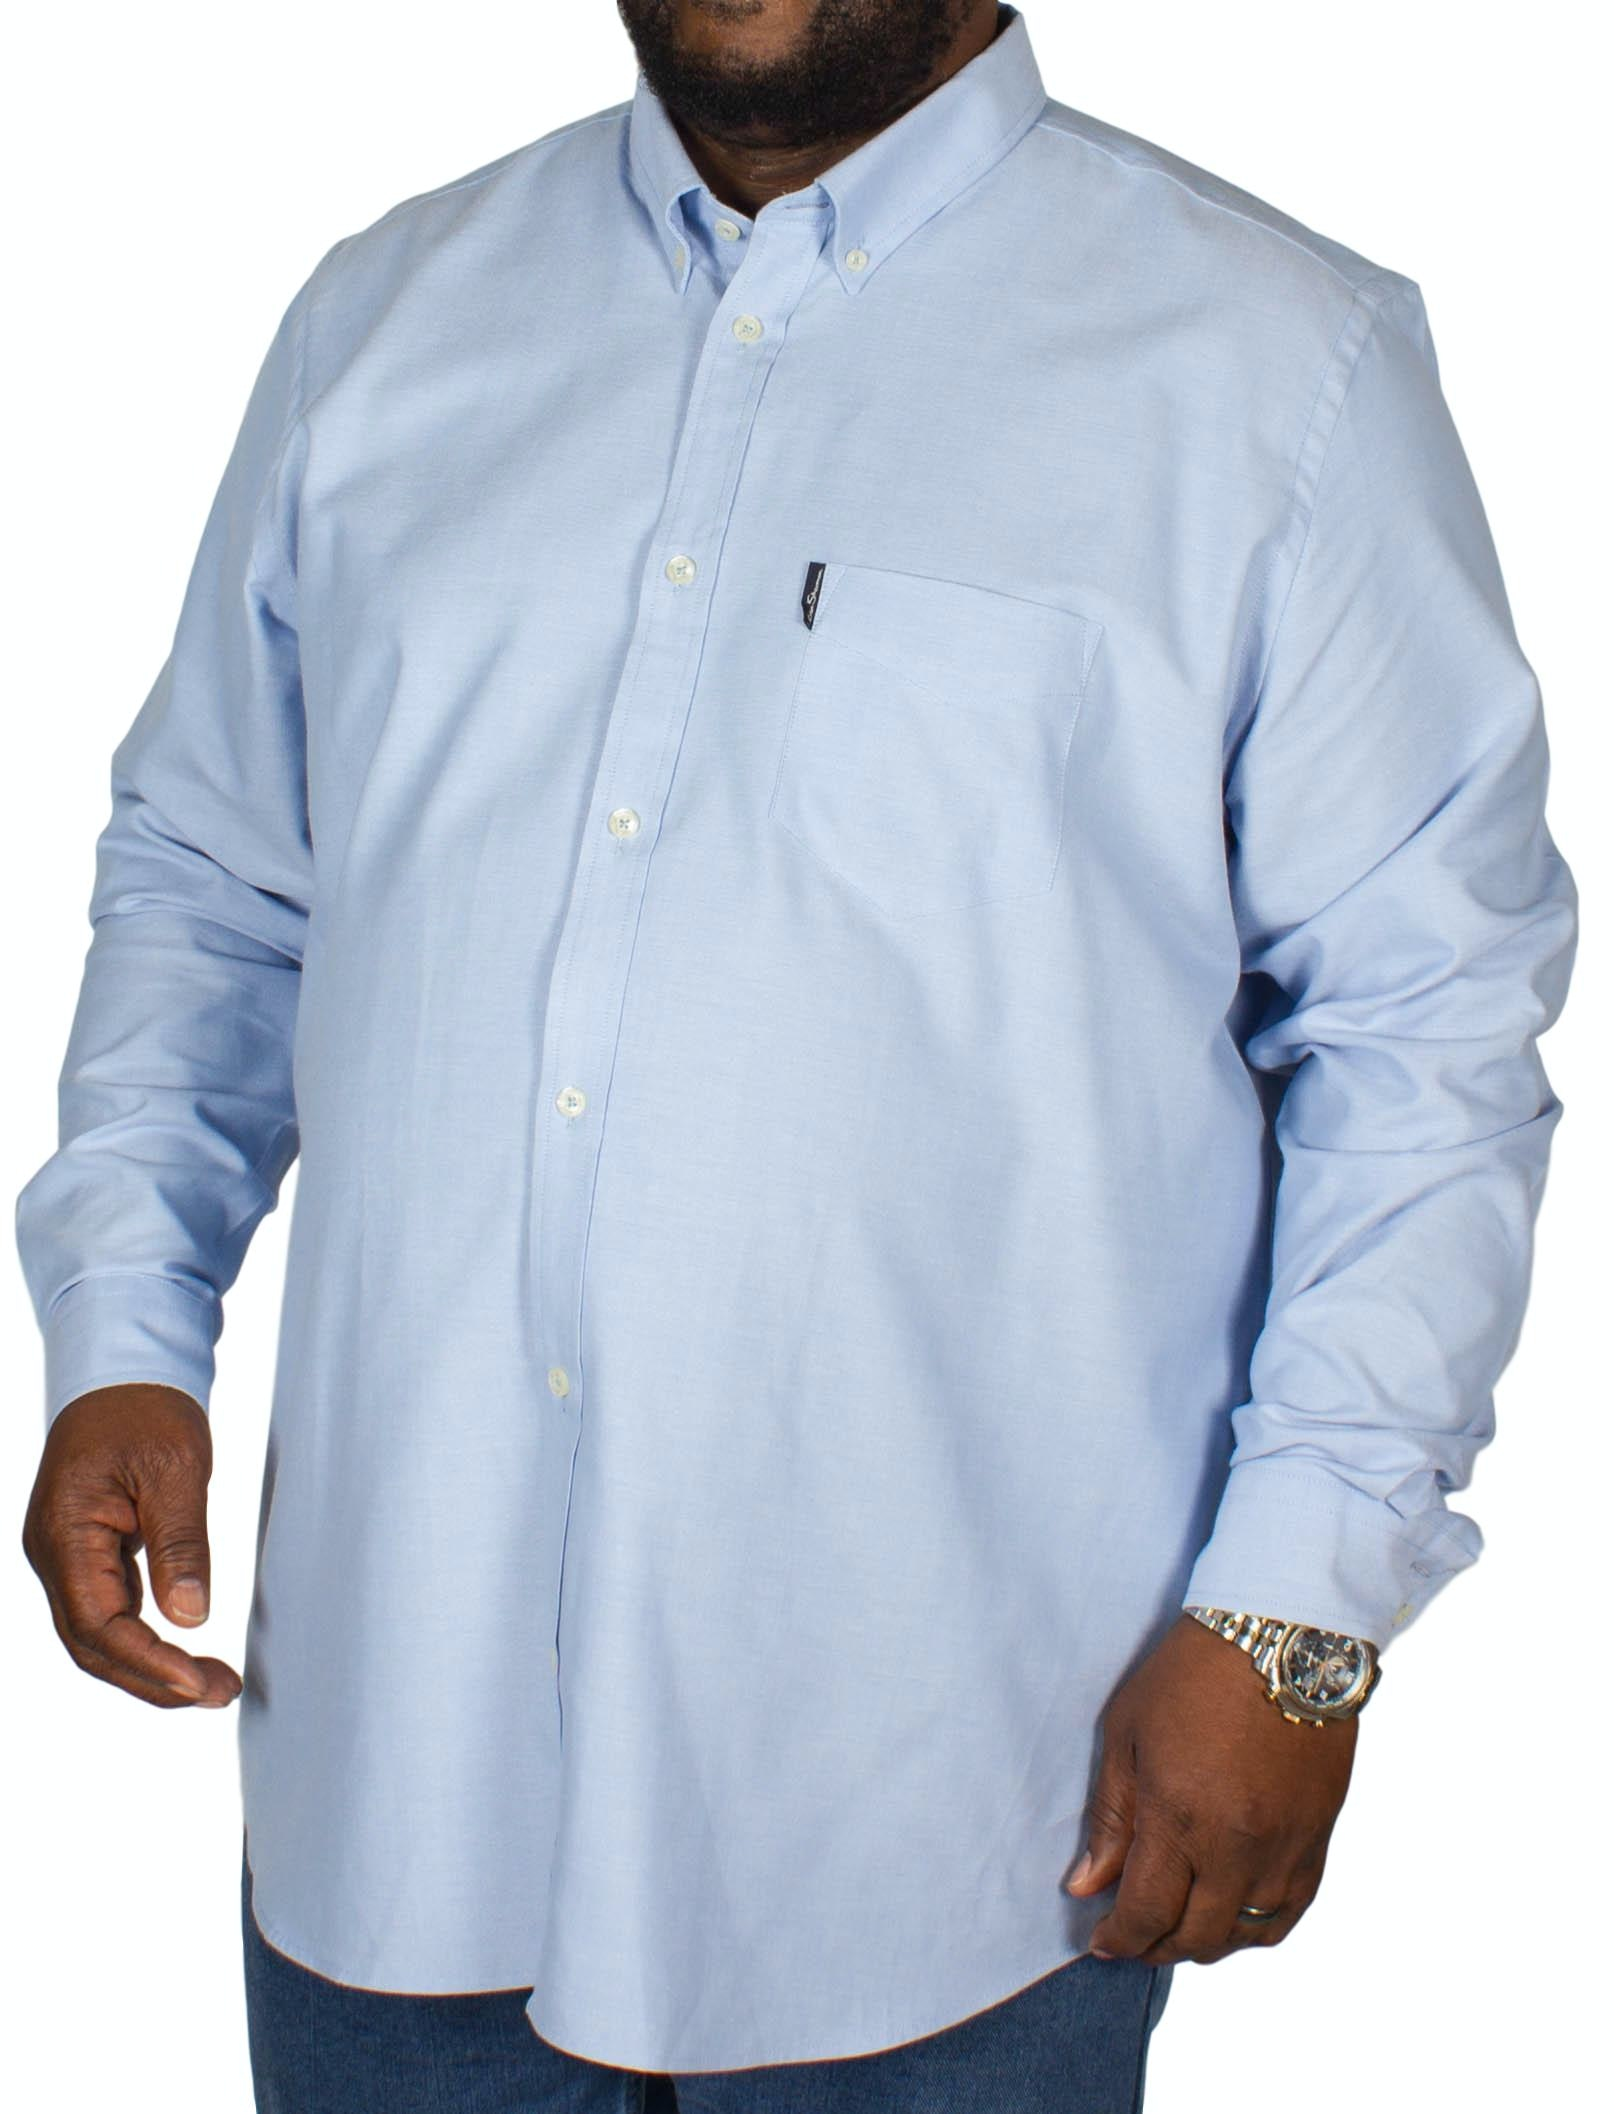 Ben Sherman Plain Oxford Long Sleeve Shirt Light Blue